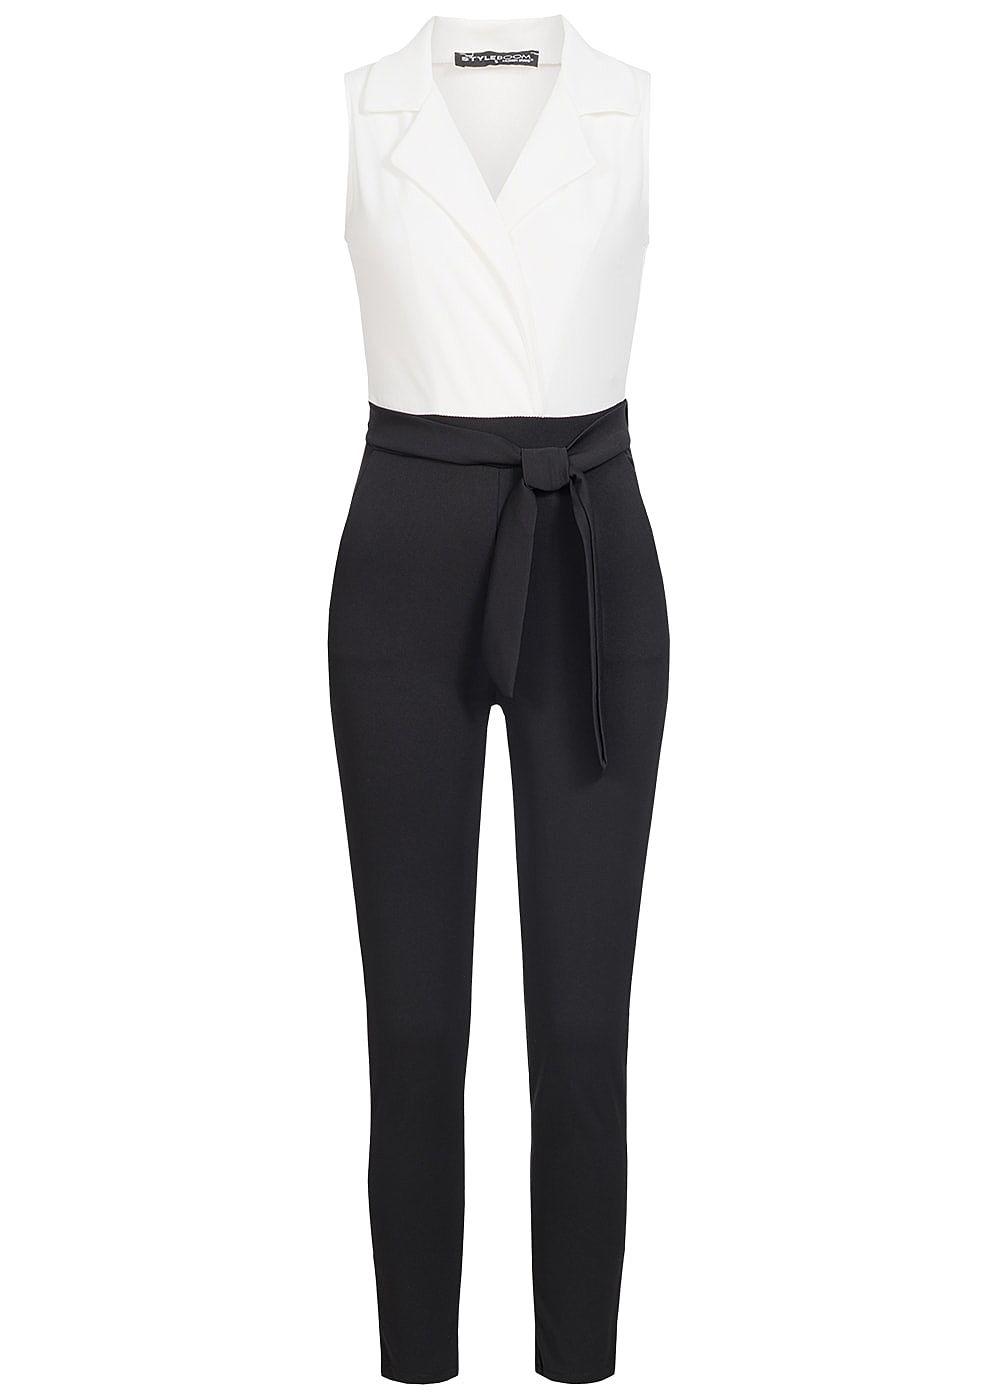 styleboom fashion damen 2 tone jumpsuit wickeloptik g rtel. Black Bedroom Furniture Sets. Home Design Ideas